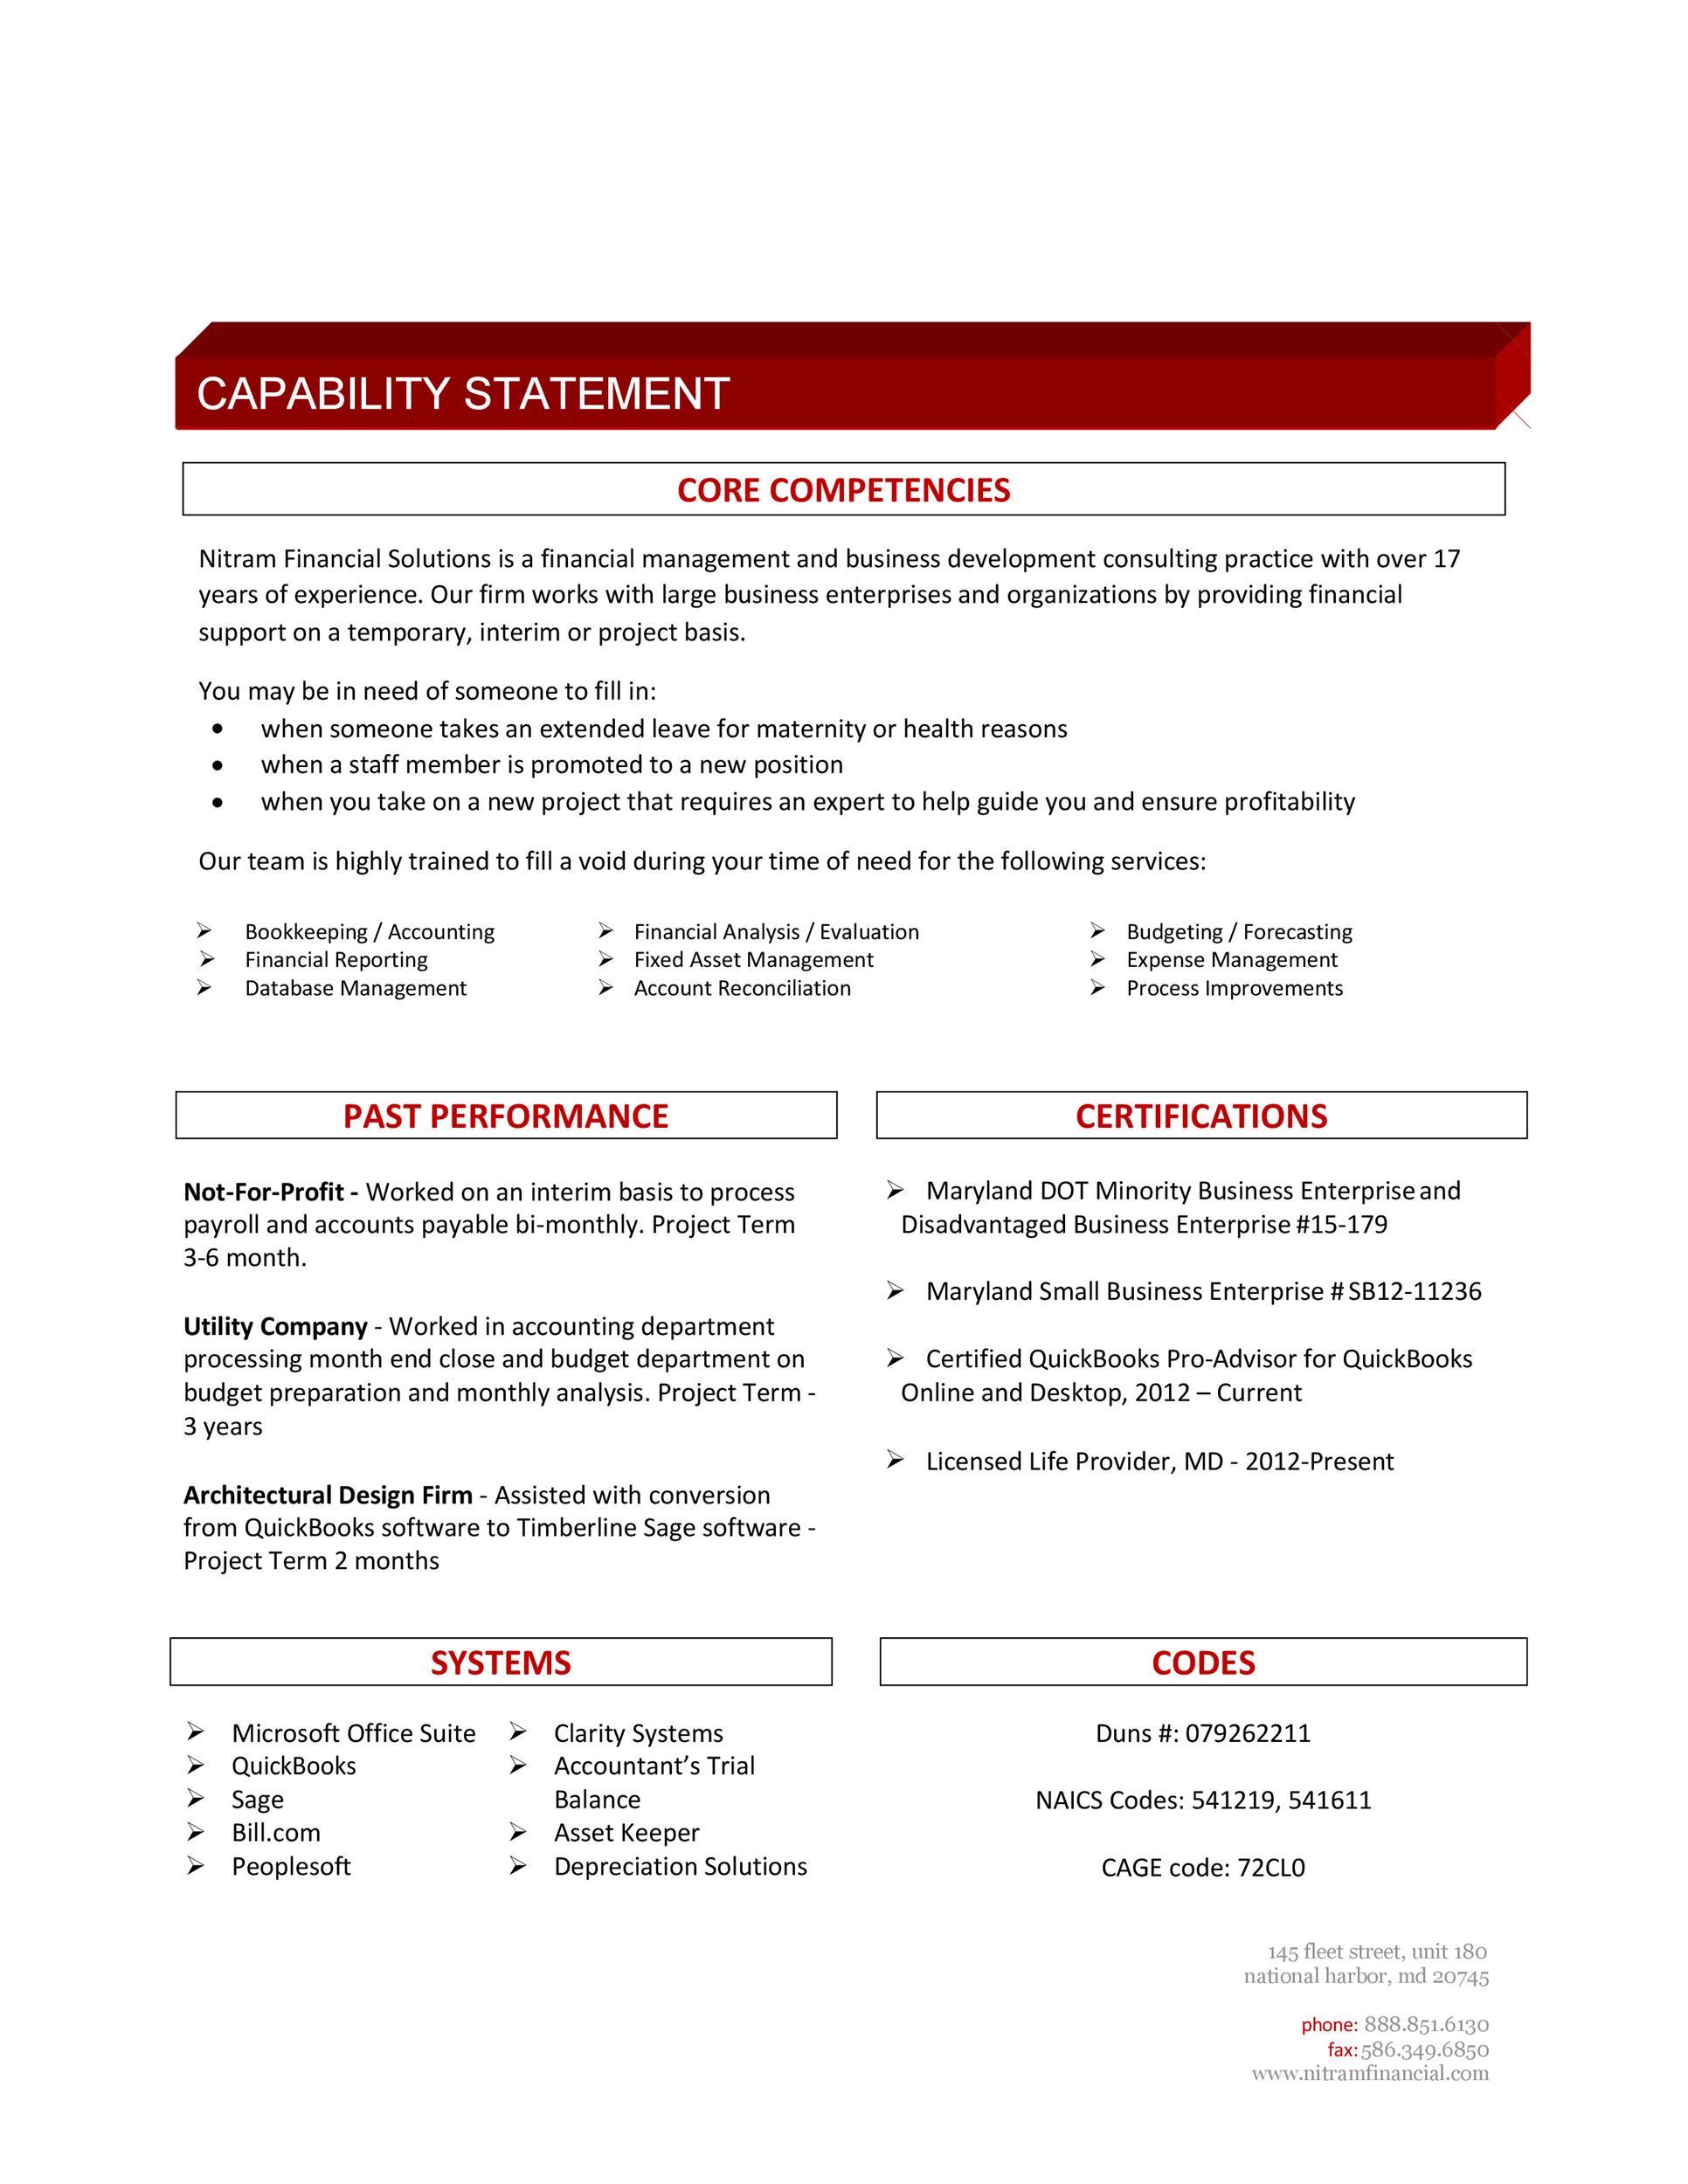 Free capability statement 39